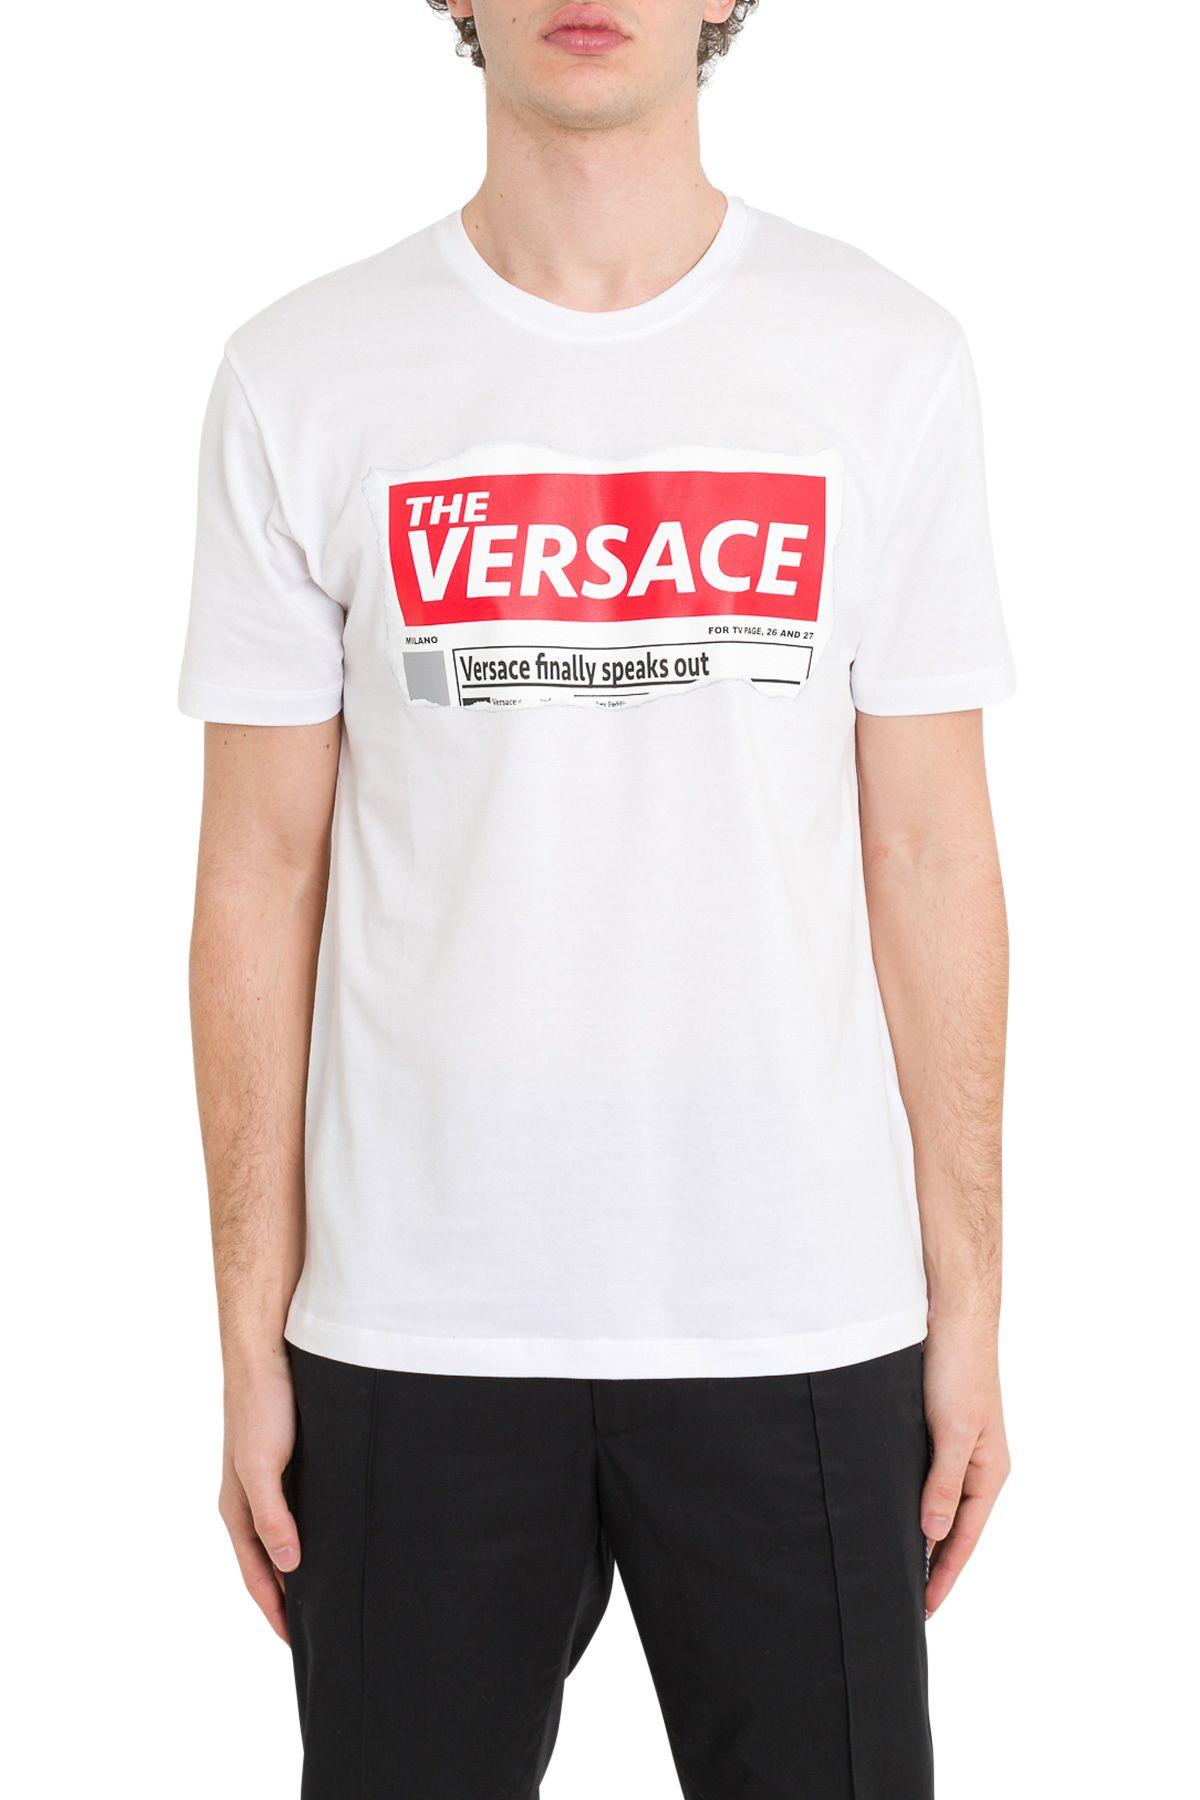 b9541a50c Versace Versace Versace Speaks Out Tee - Bianco - 10803404 | italist